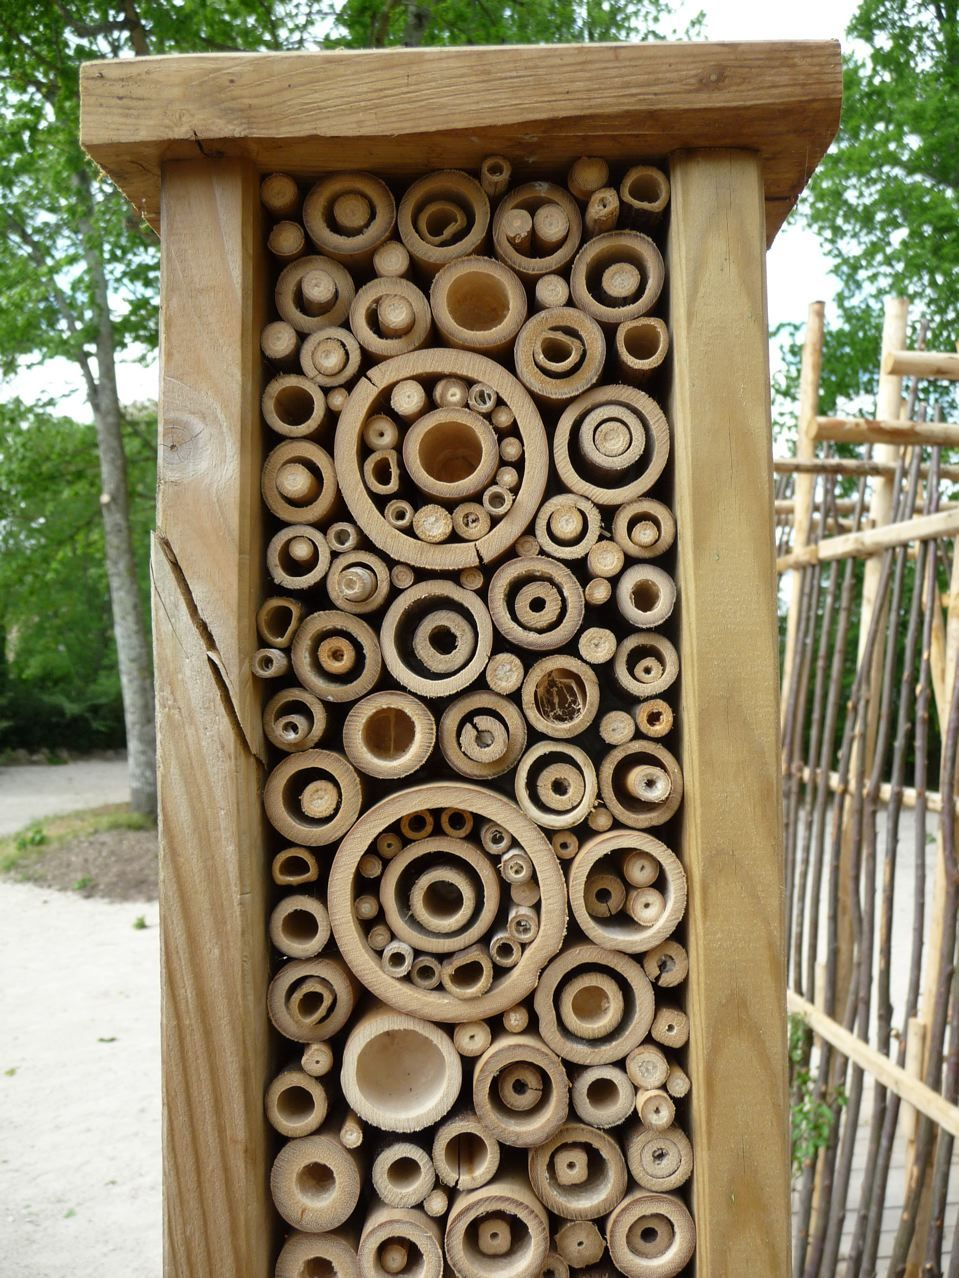 bug hotel hlm insectes de michel davo le jardin d. Black Bedroom Furniture Sets. Home Design Ideas